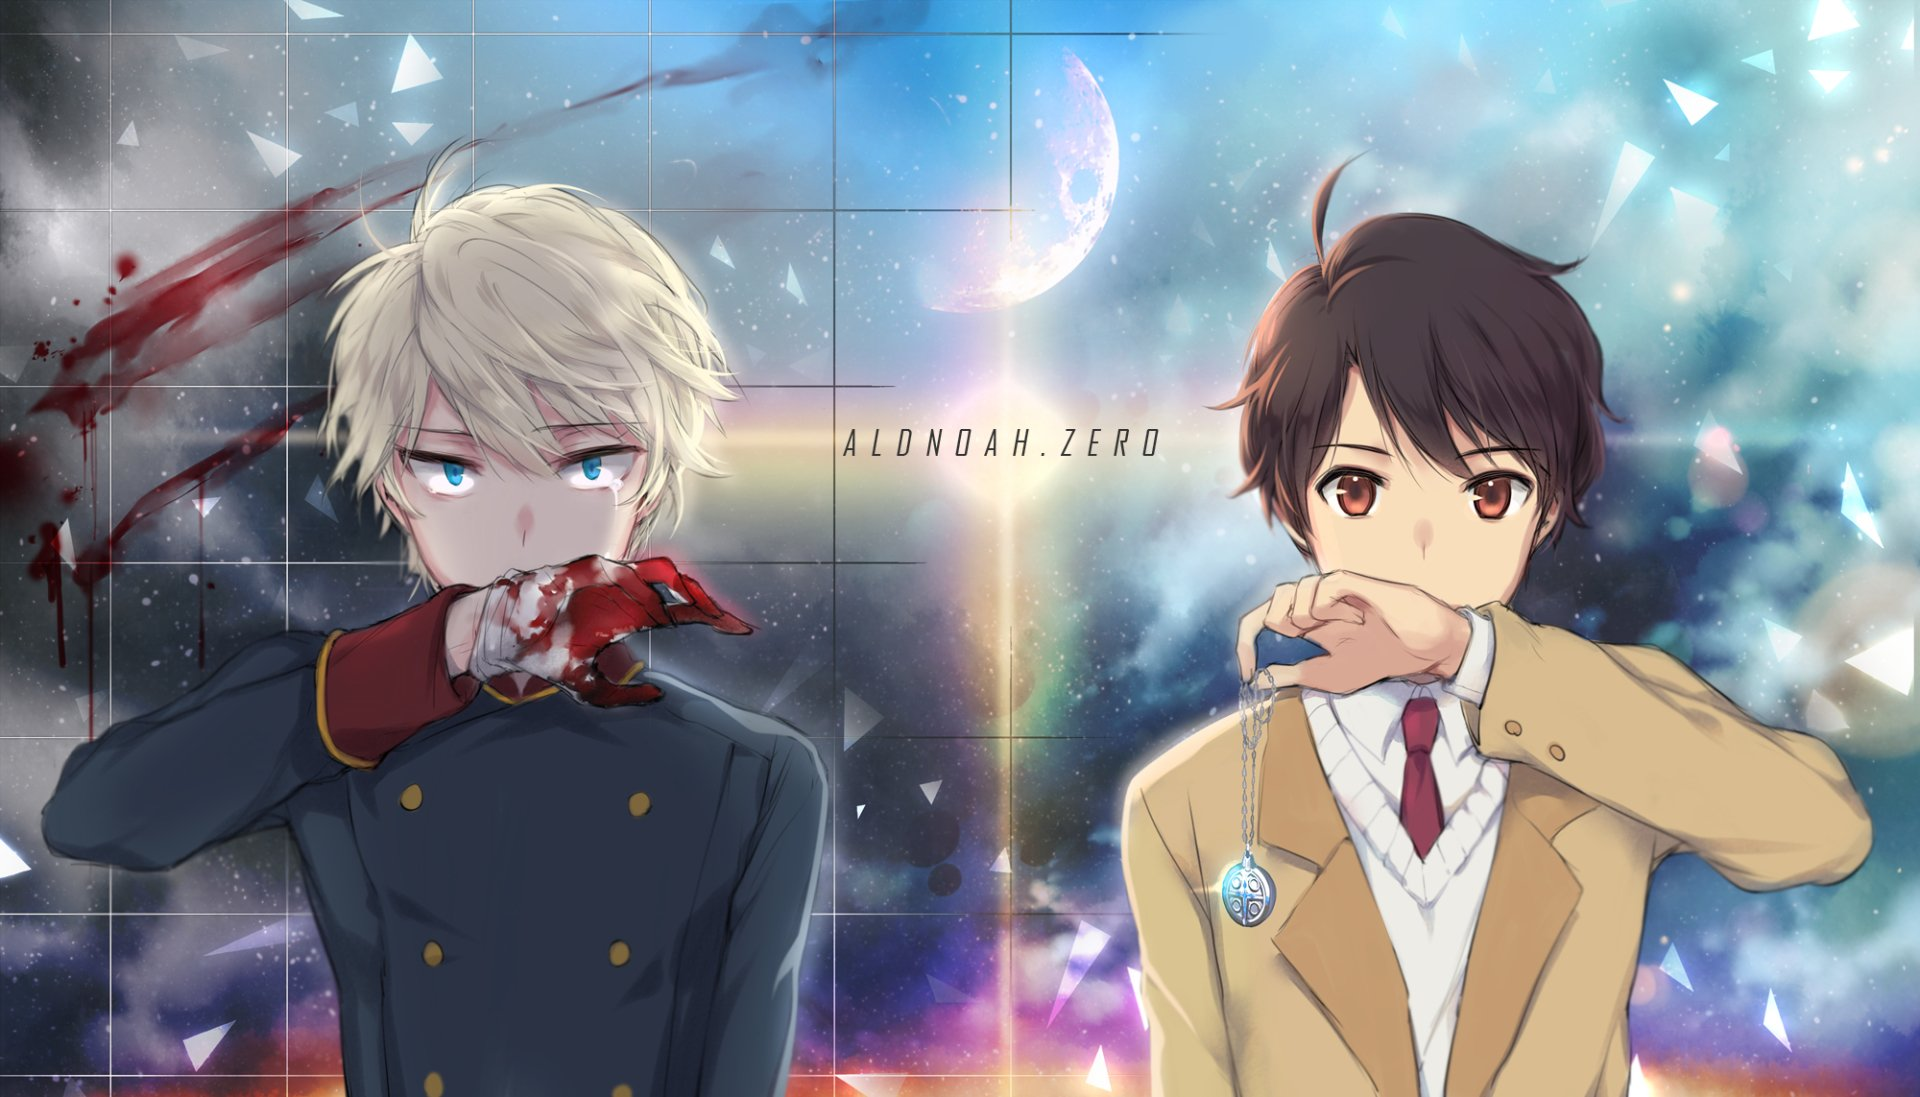 Anime - Aldnoah.Zero  Inaho Kaizuka Slaine Troyard Wallpaper